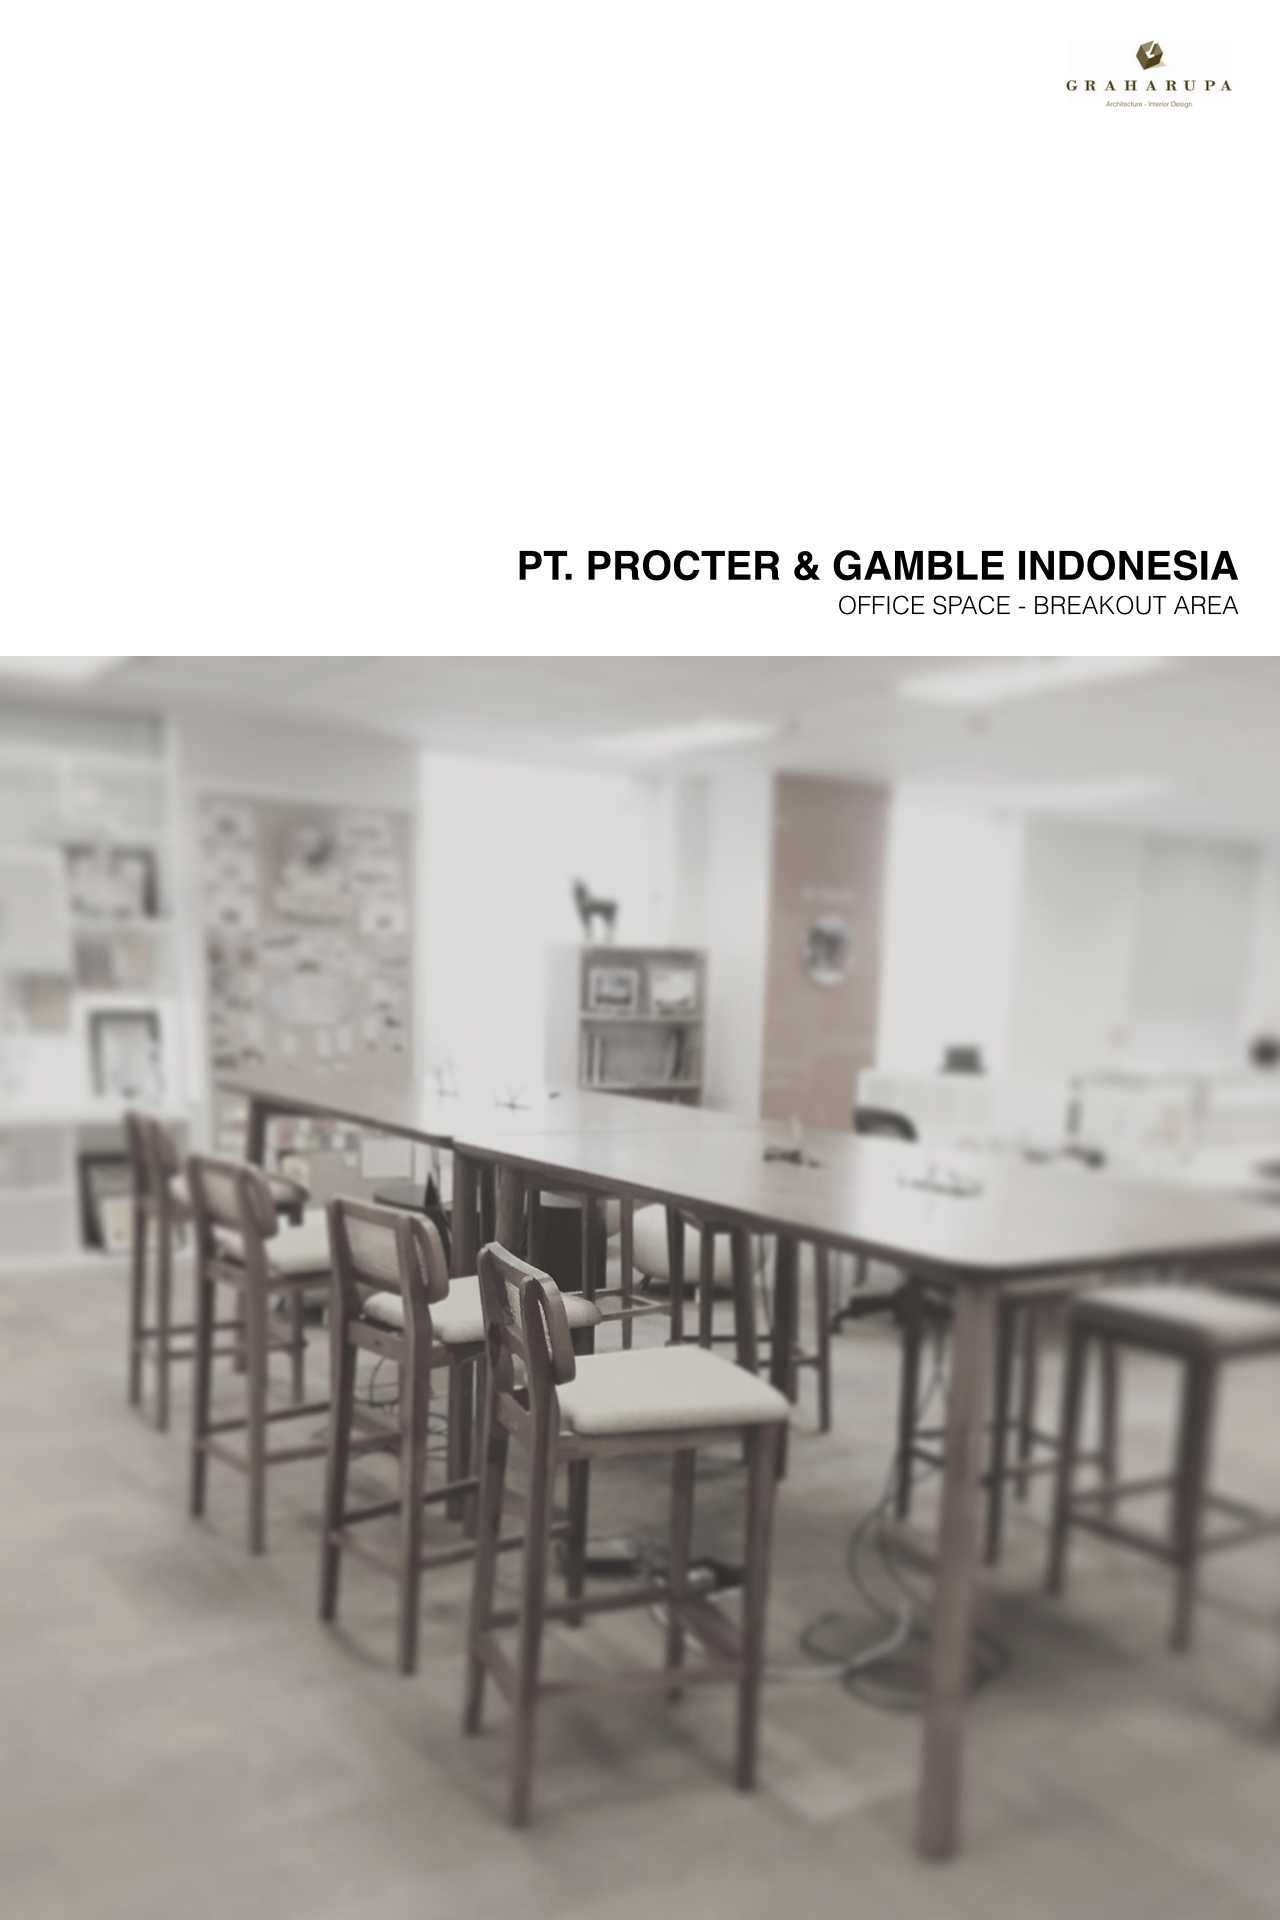 Graharupa Cipta Kirana Pt. P&g  Indonesia_Breakout Area Jakarta Jakarta Gck-Company-Profile-Portofolio-2016-09 Minimalis  14141